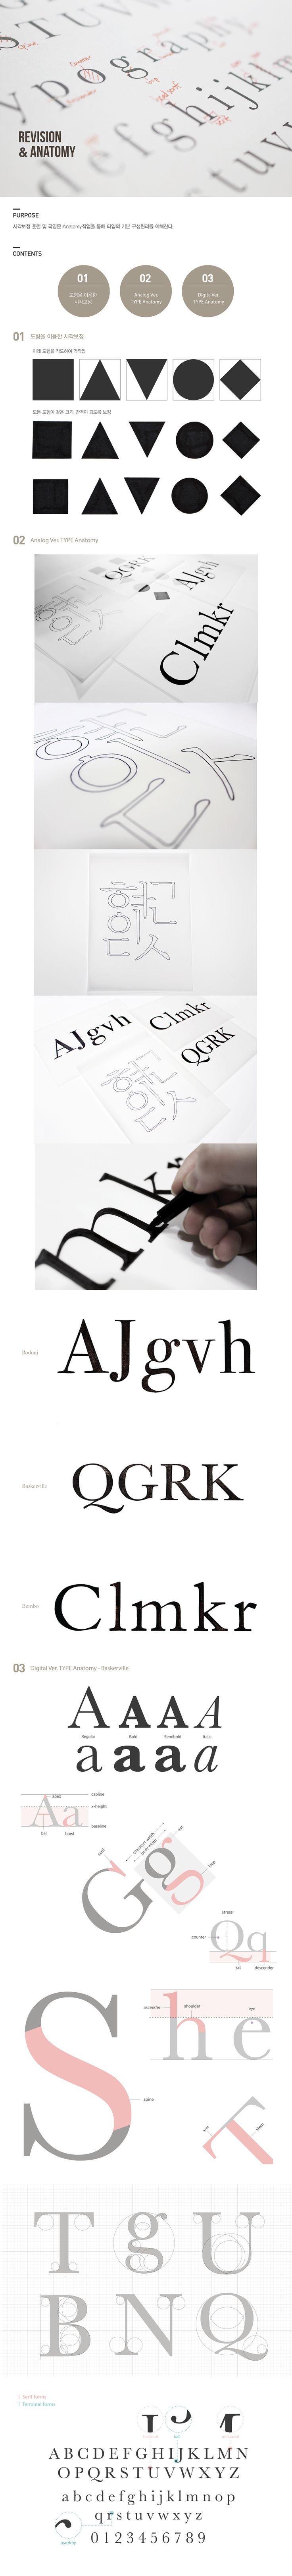 Revision & Type Anatomy